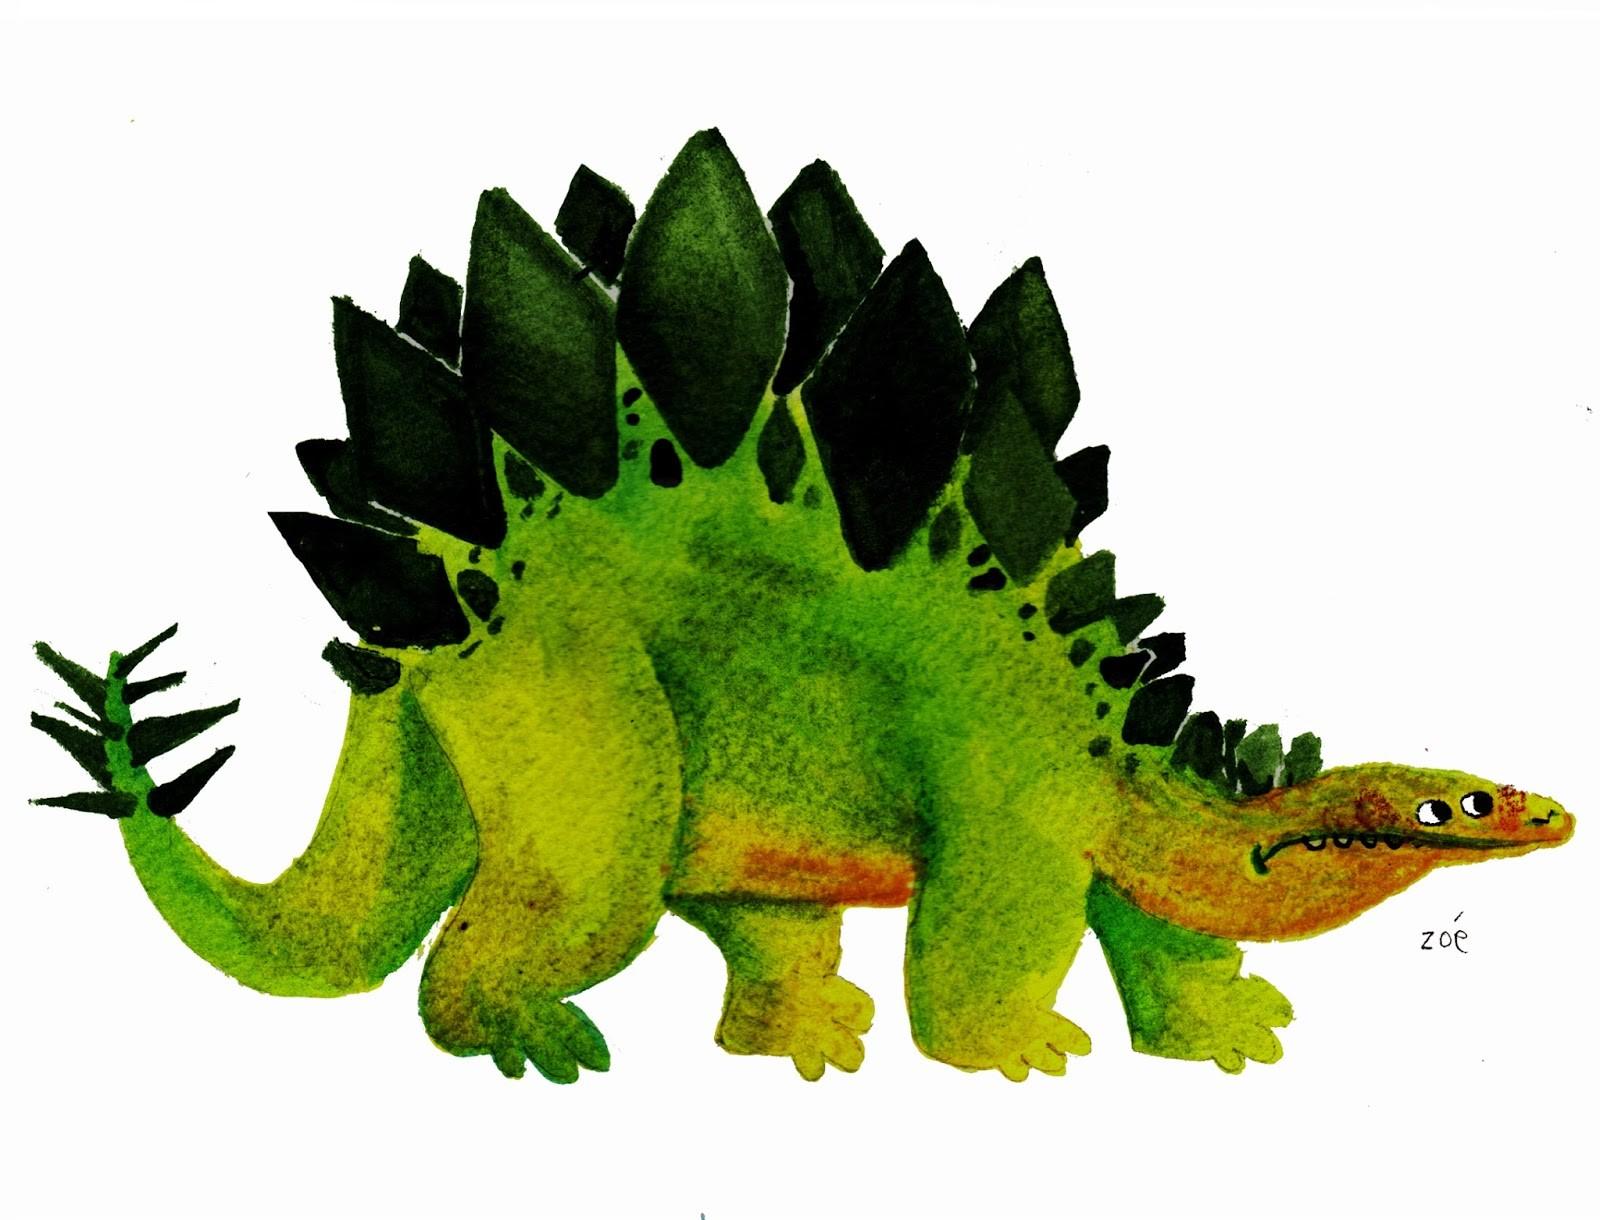 Zoe bergeret zoe bergeret stegosaure